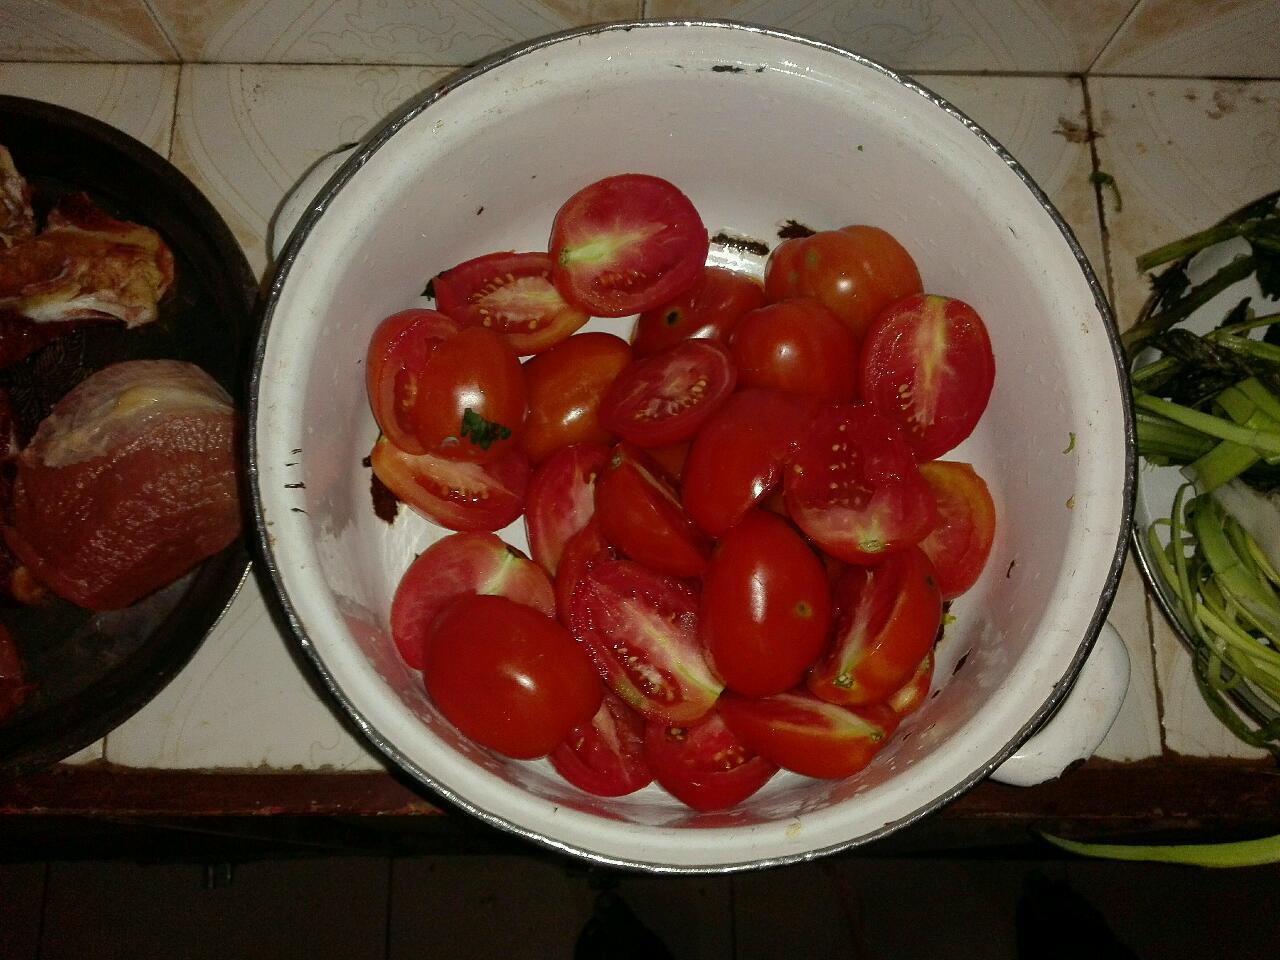 Ragout de pommes à la 237 🔥🔥💝💝 Made by @Jusdu237                                                        https://www.facebook.com/jusdu237/ #jusdu237 #food #opus